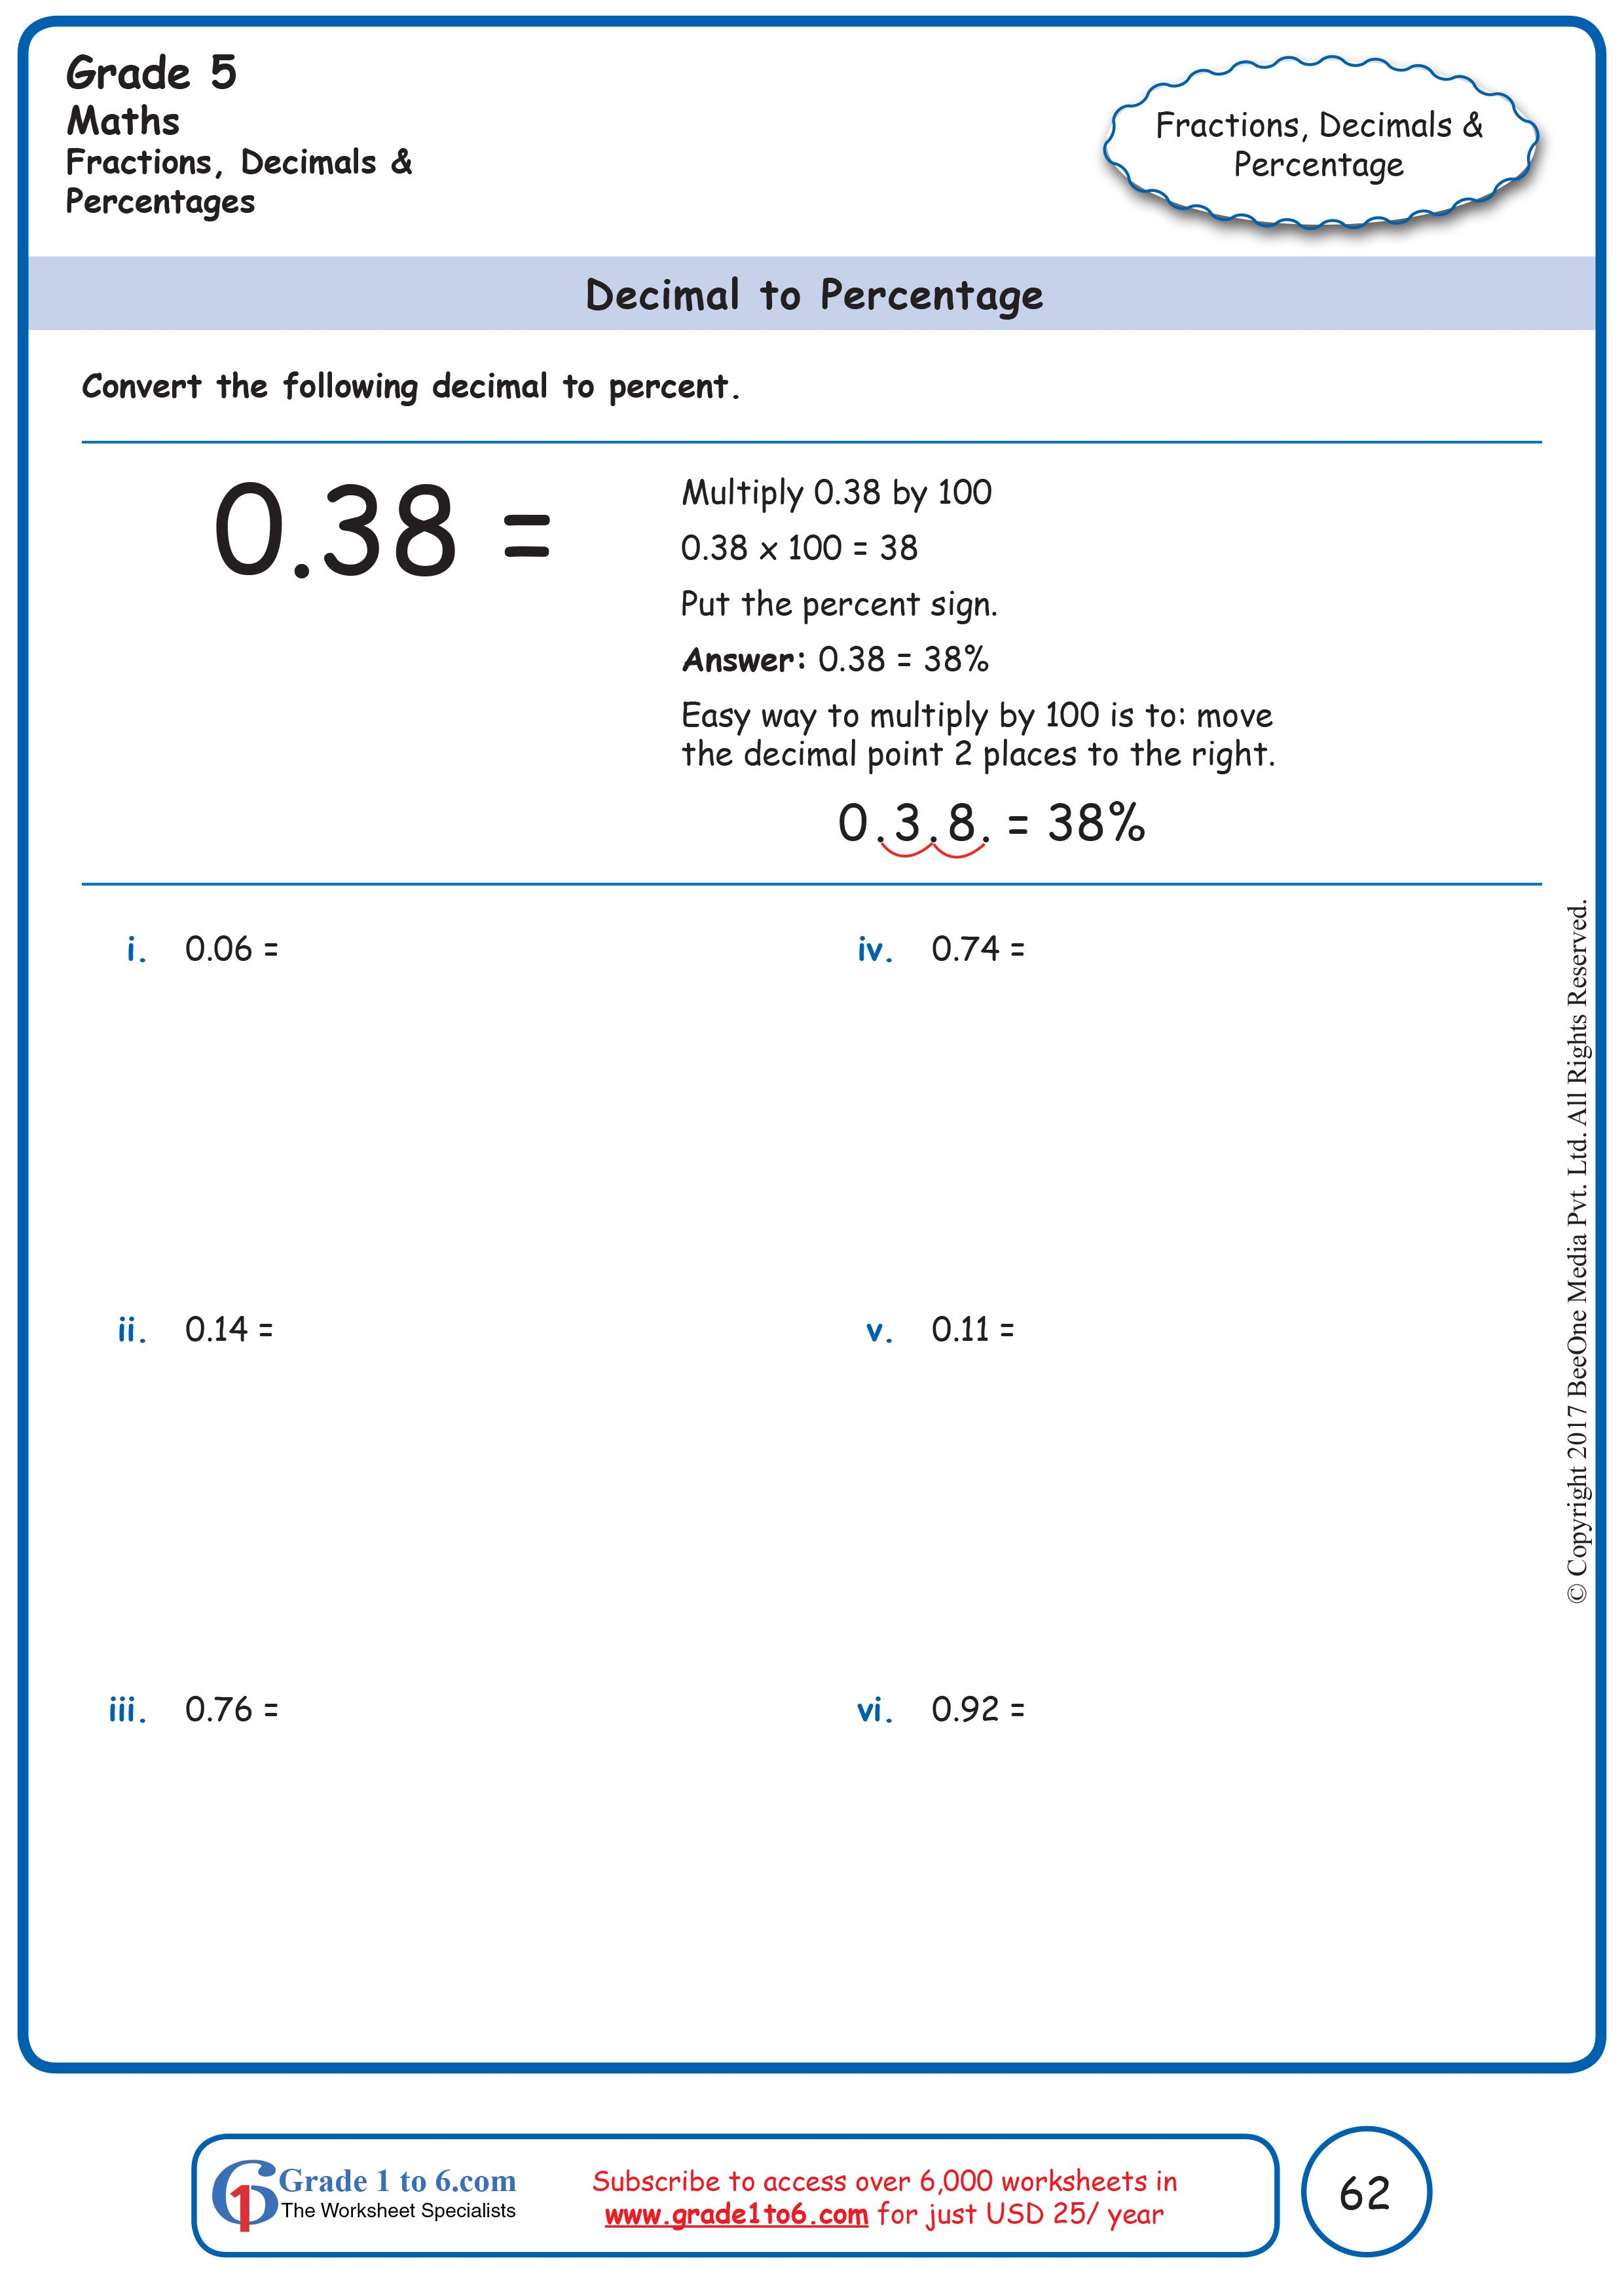 Decimals To Percentage Grade 5 Math